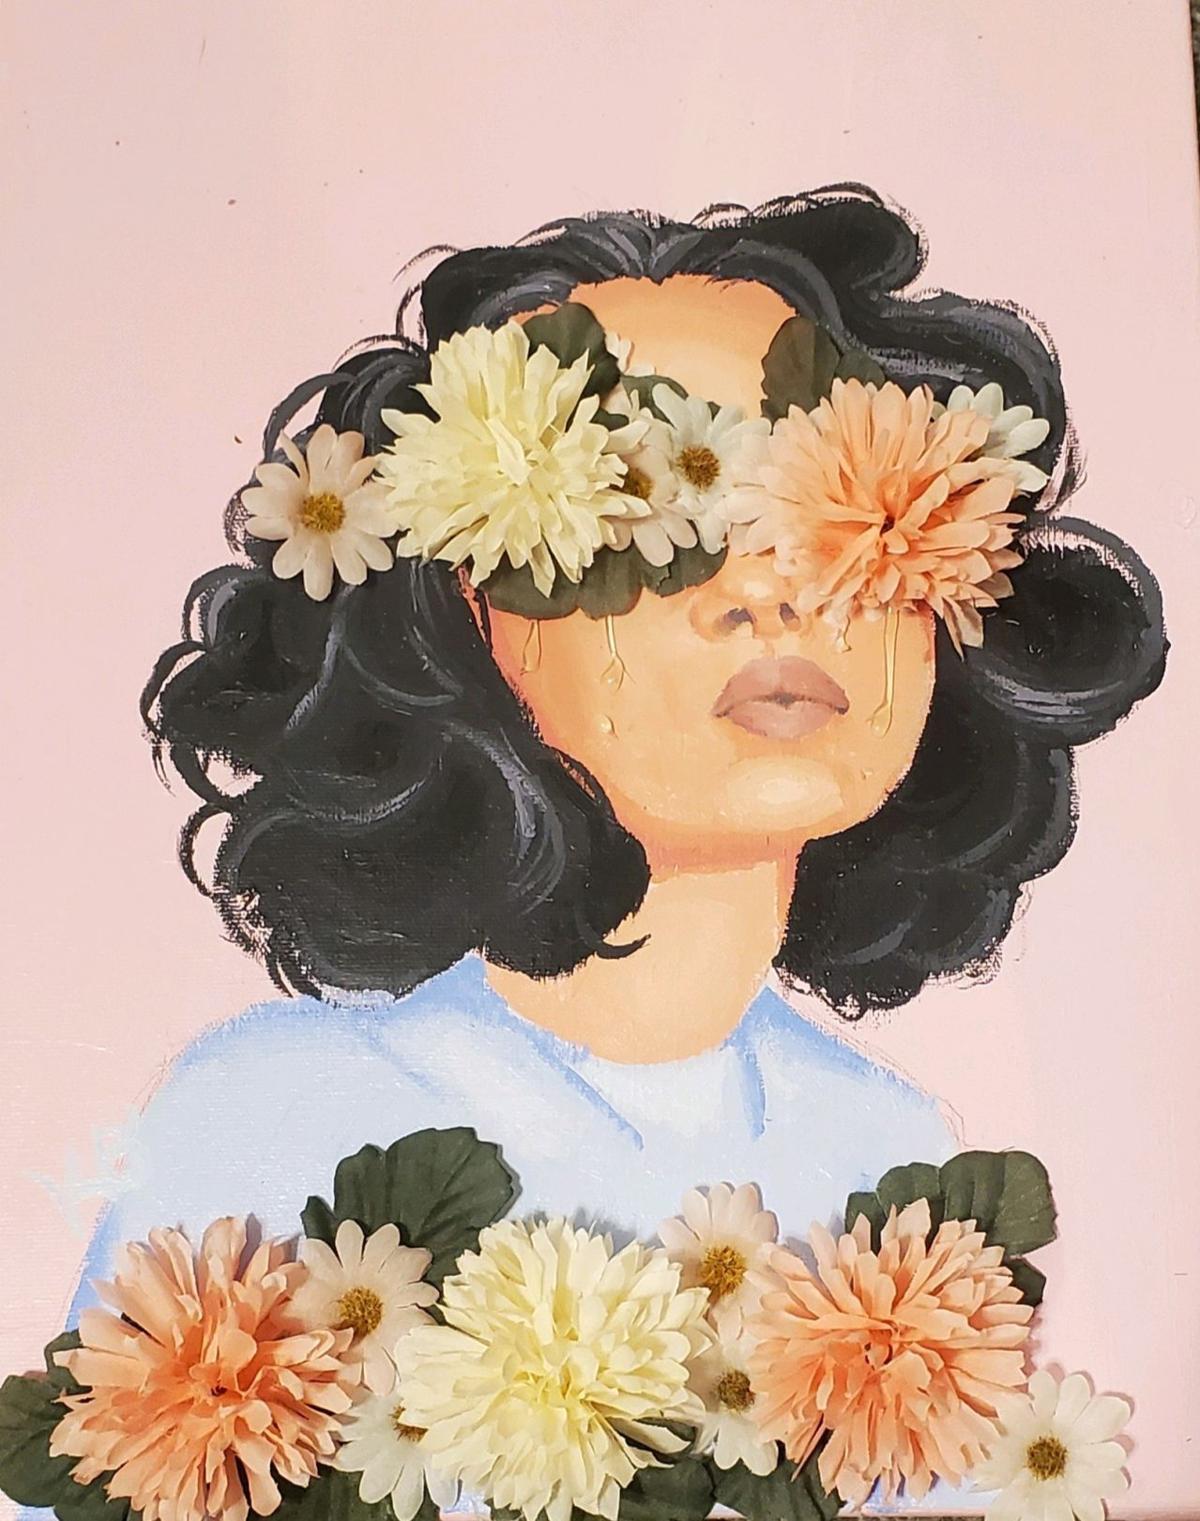 """Flower Girl"" by Karyss Opsal"